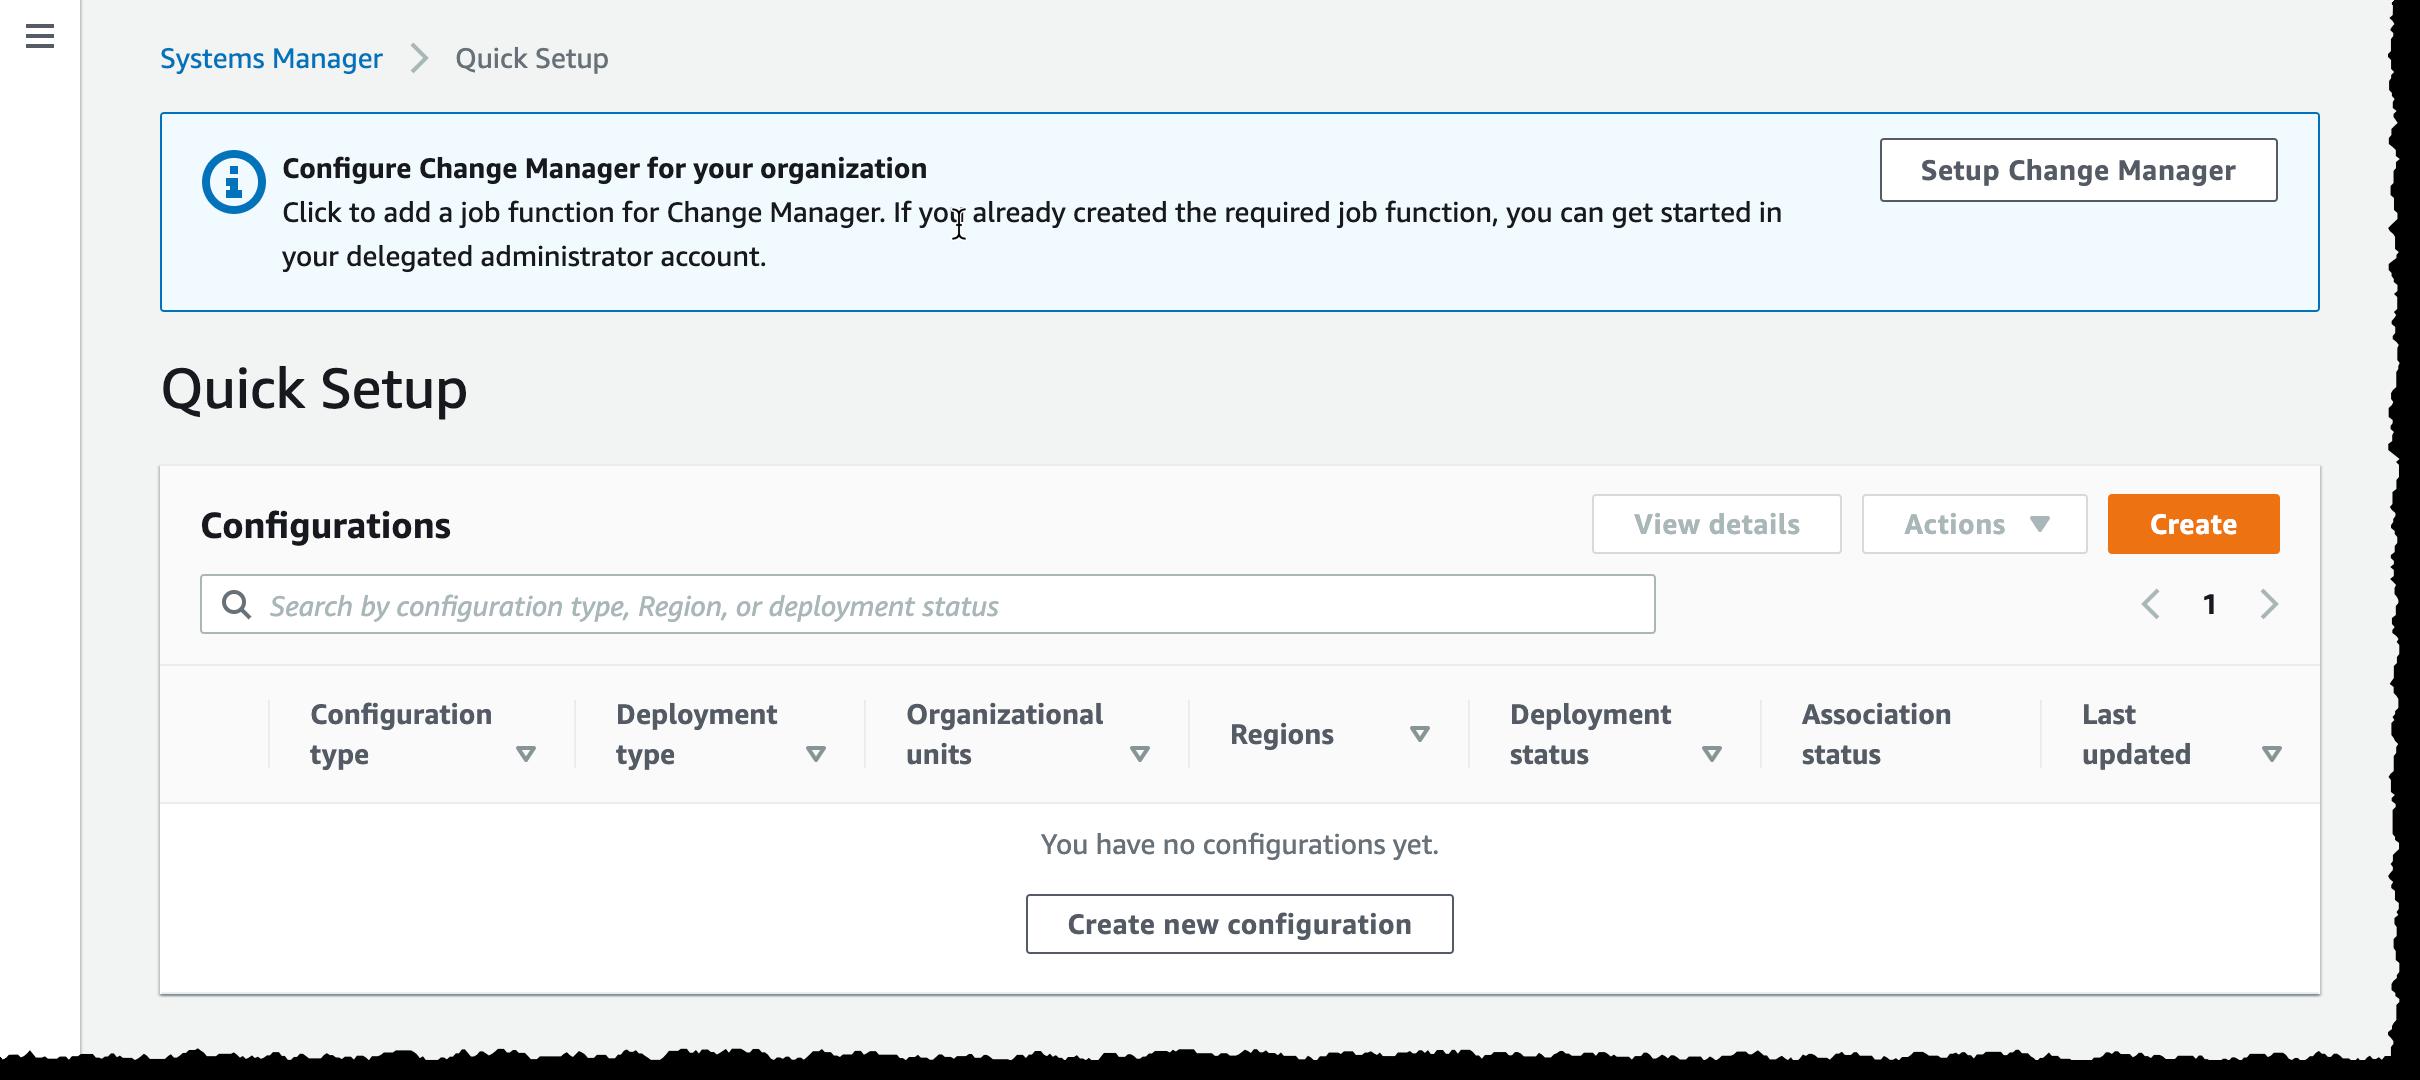 Change Manager Quick Setup